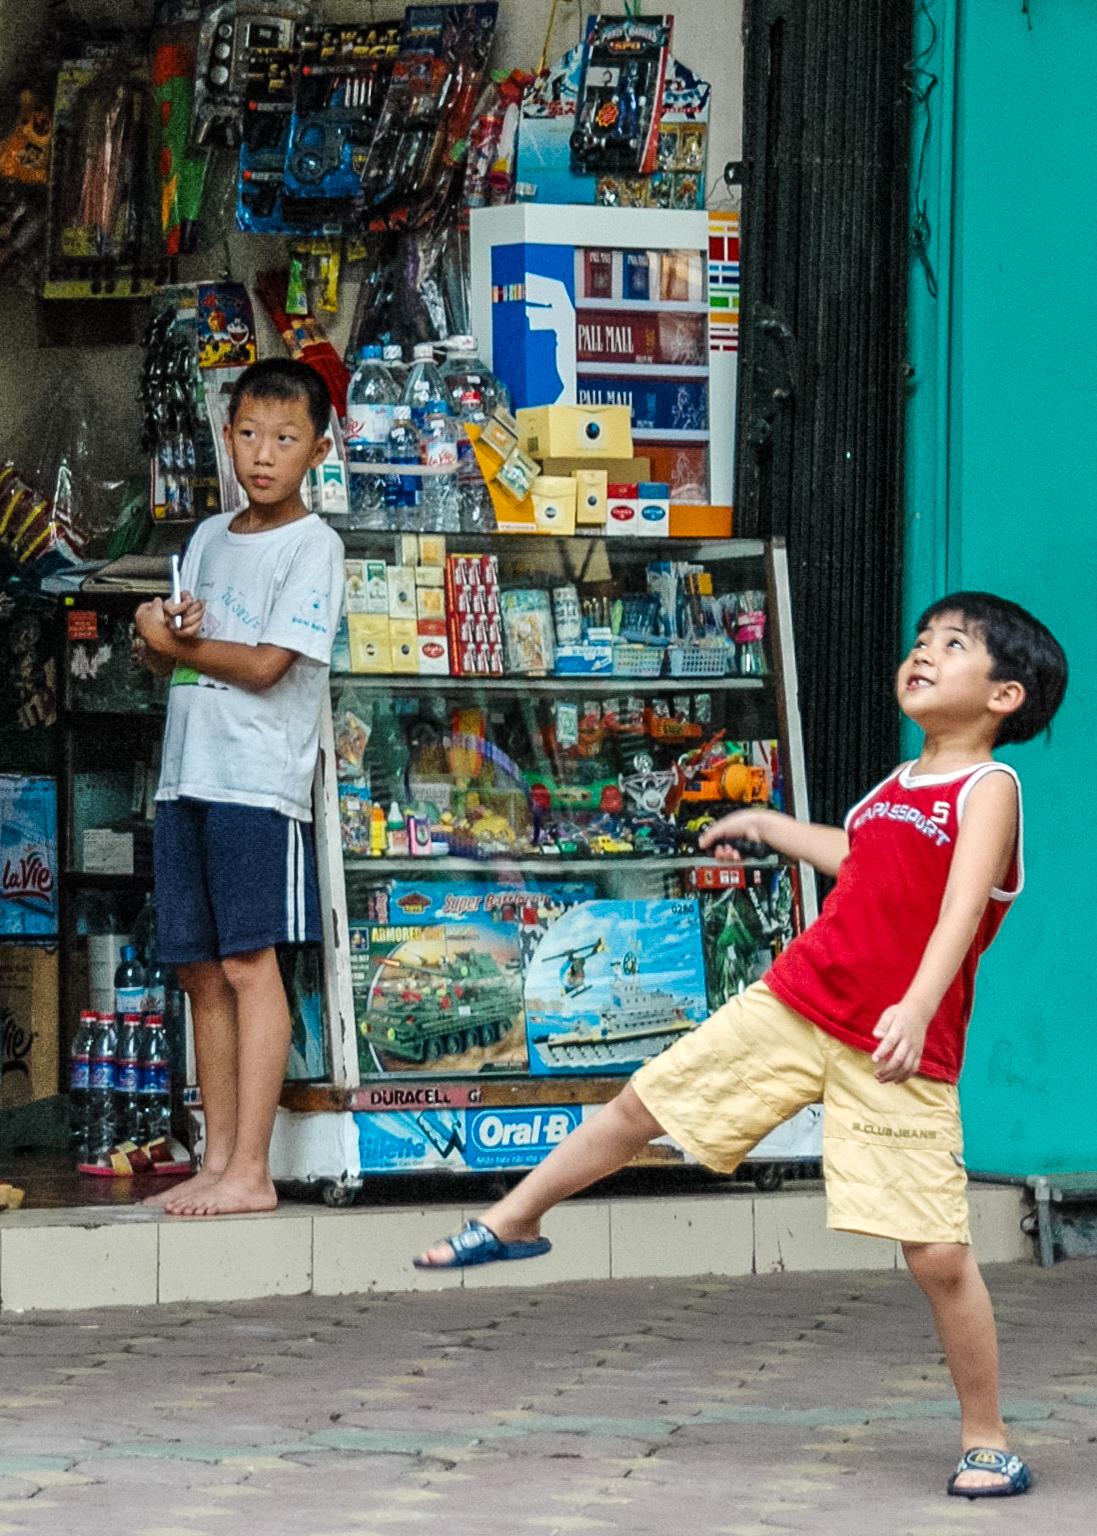 PeopleofVietnam-5.jpg